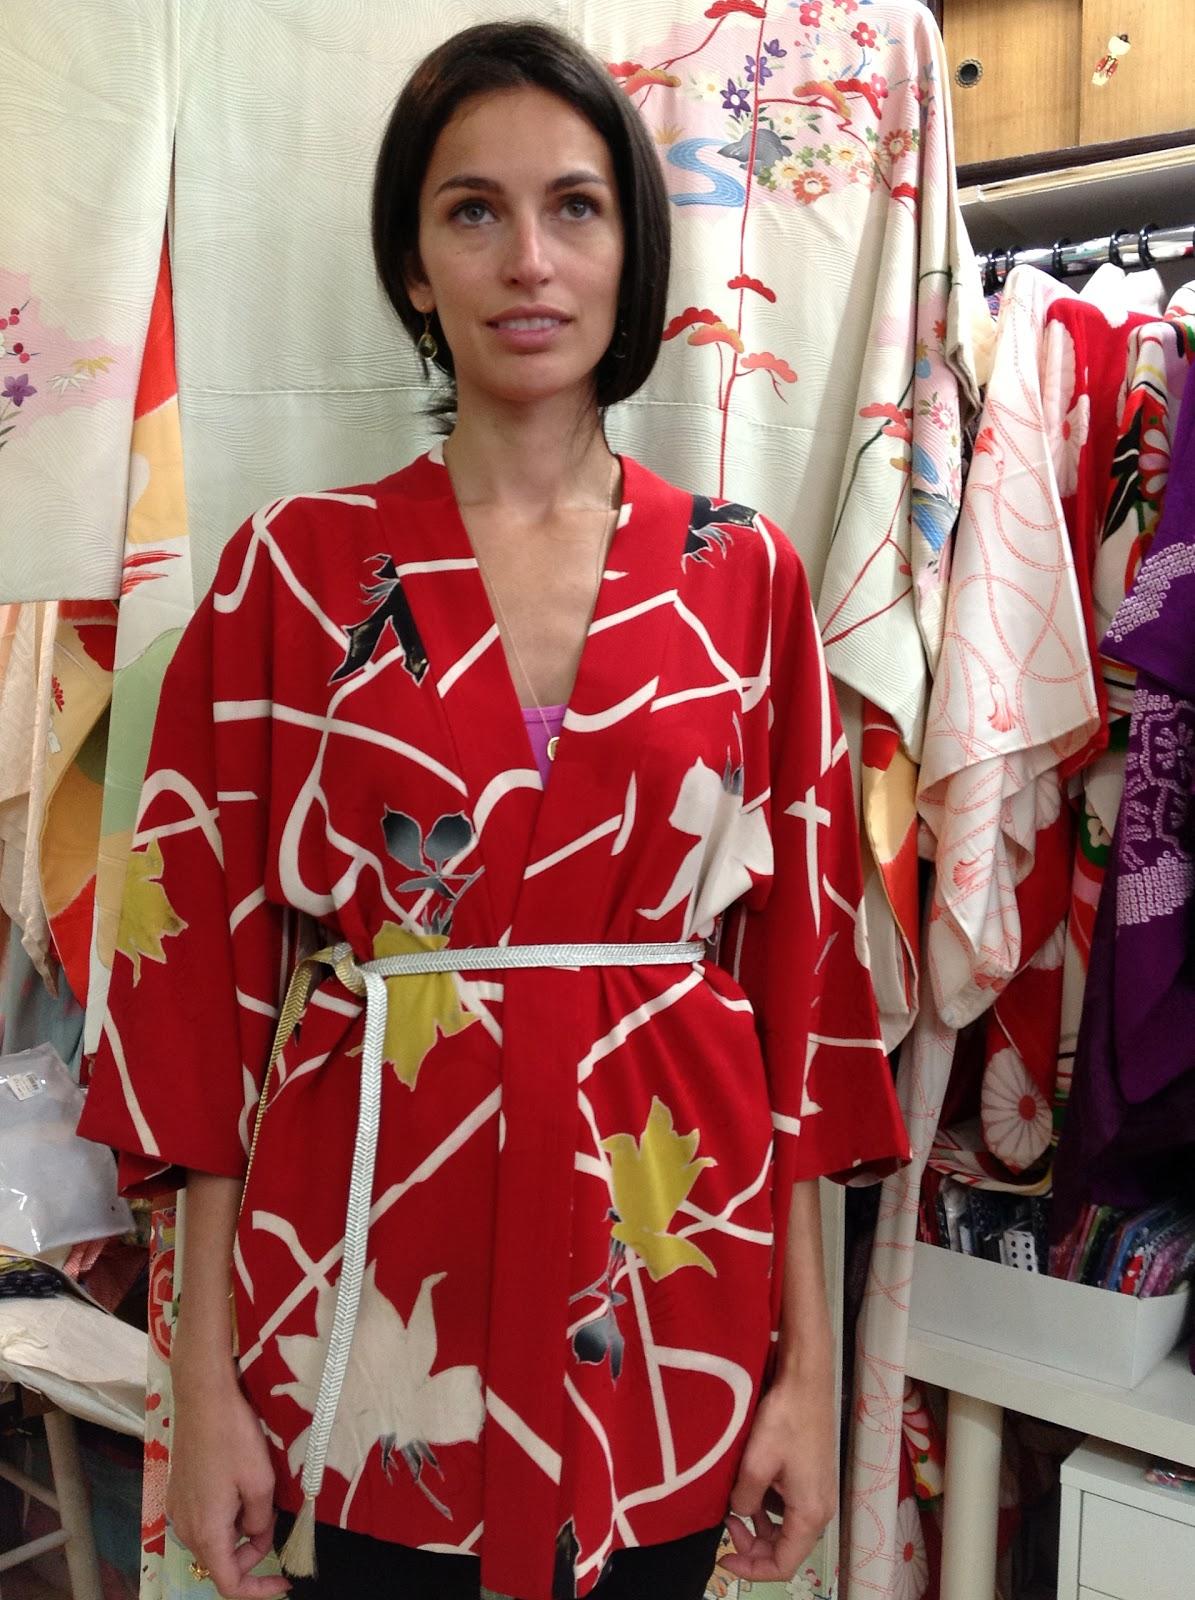 Kimono Jacket from Kimono House New York City